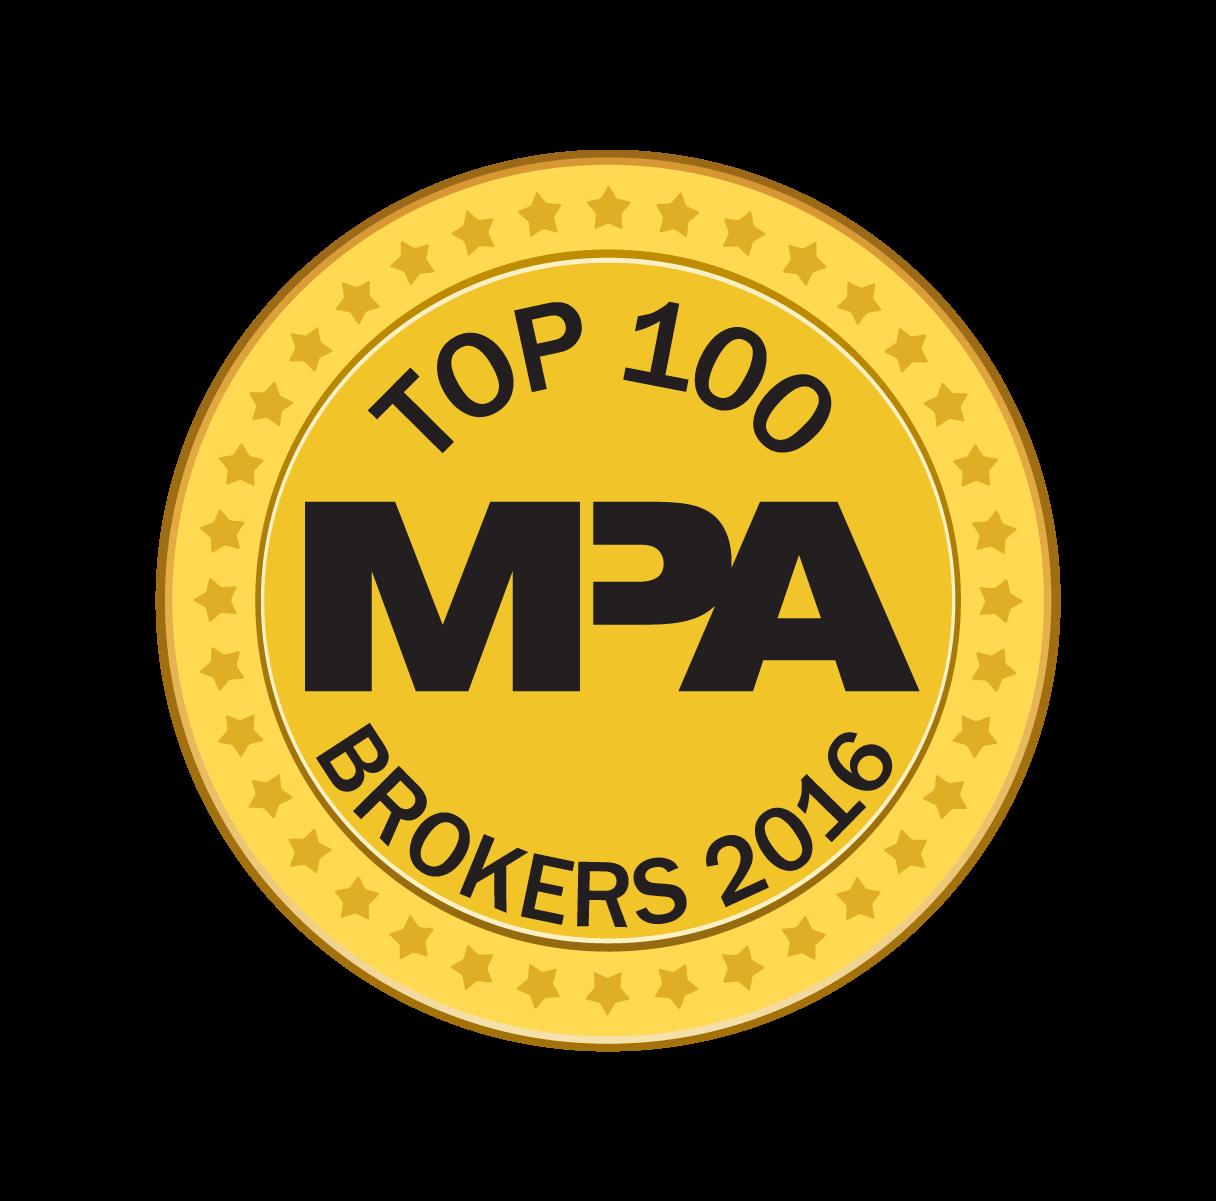 mpa-top-100-brokers-2016